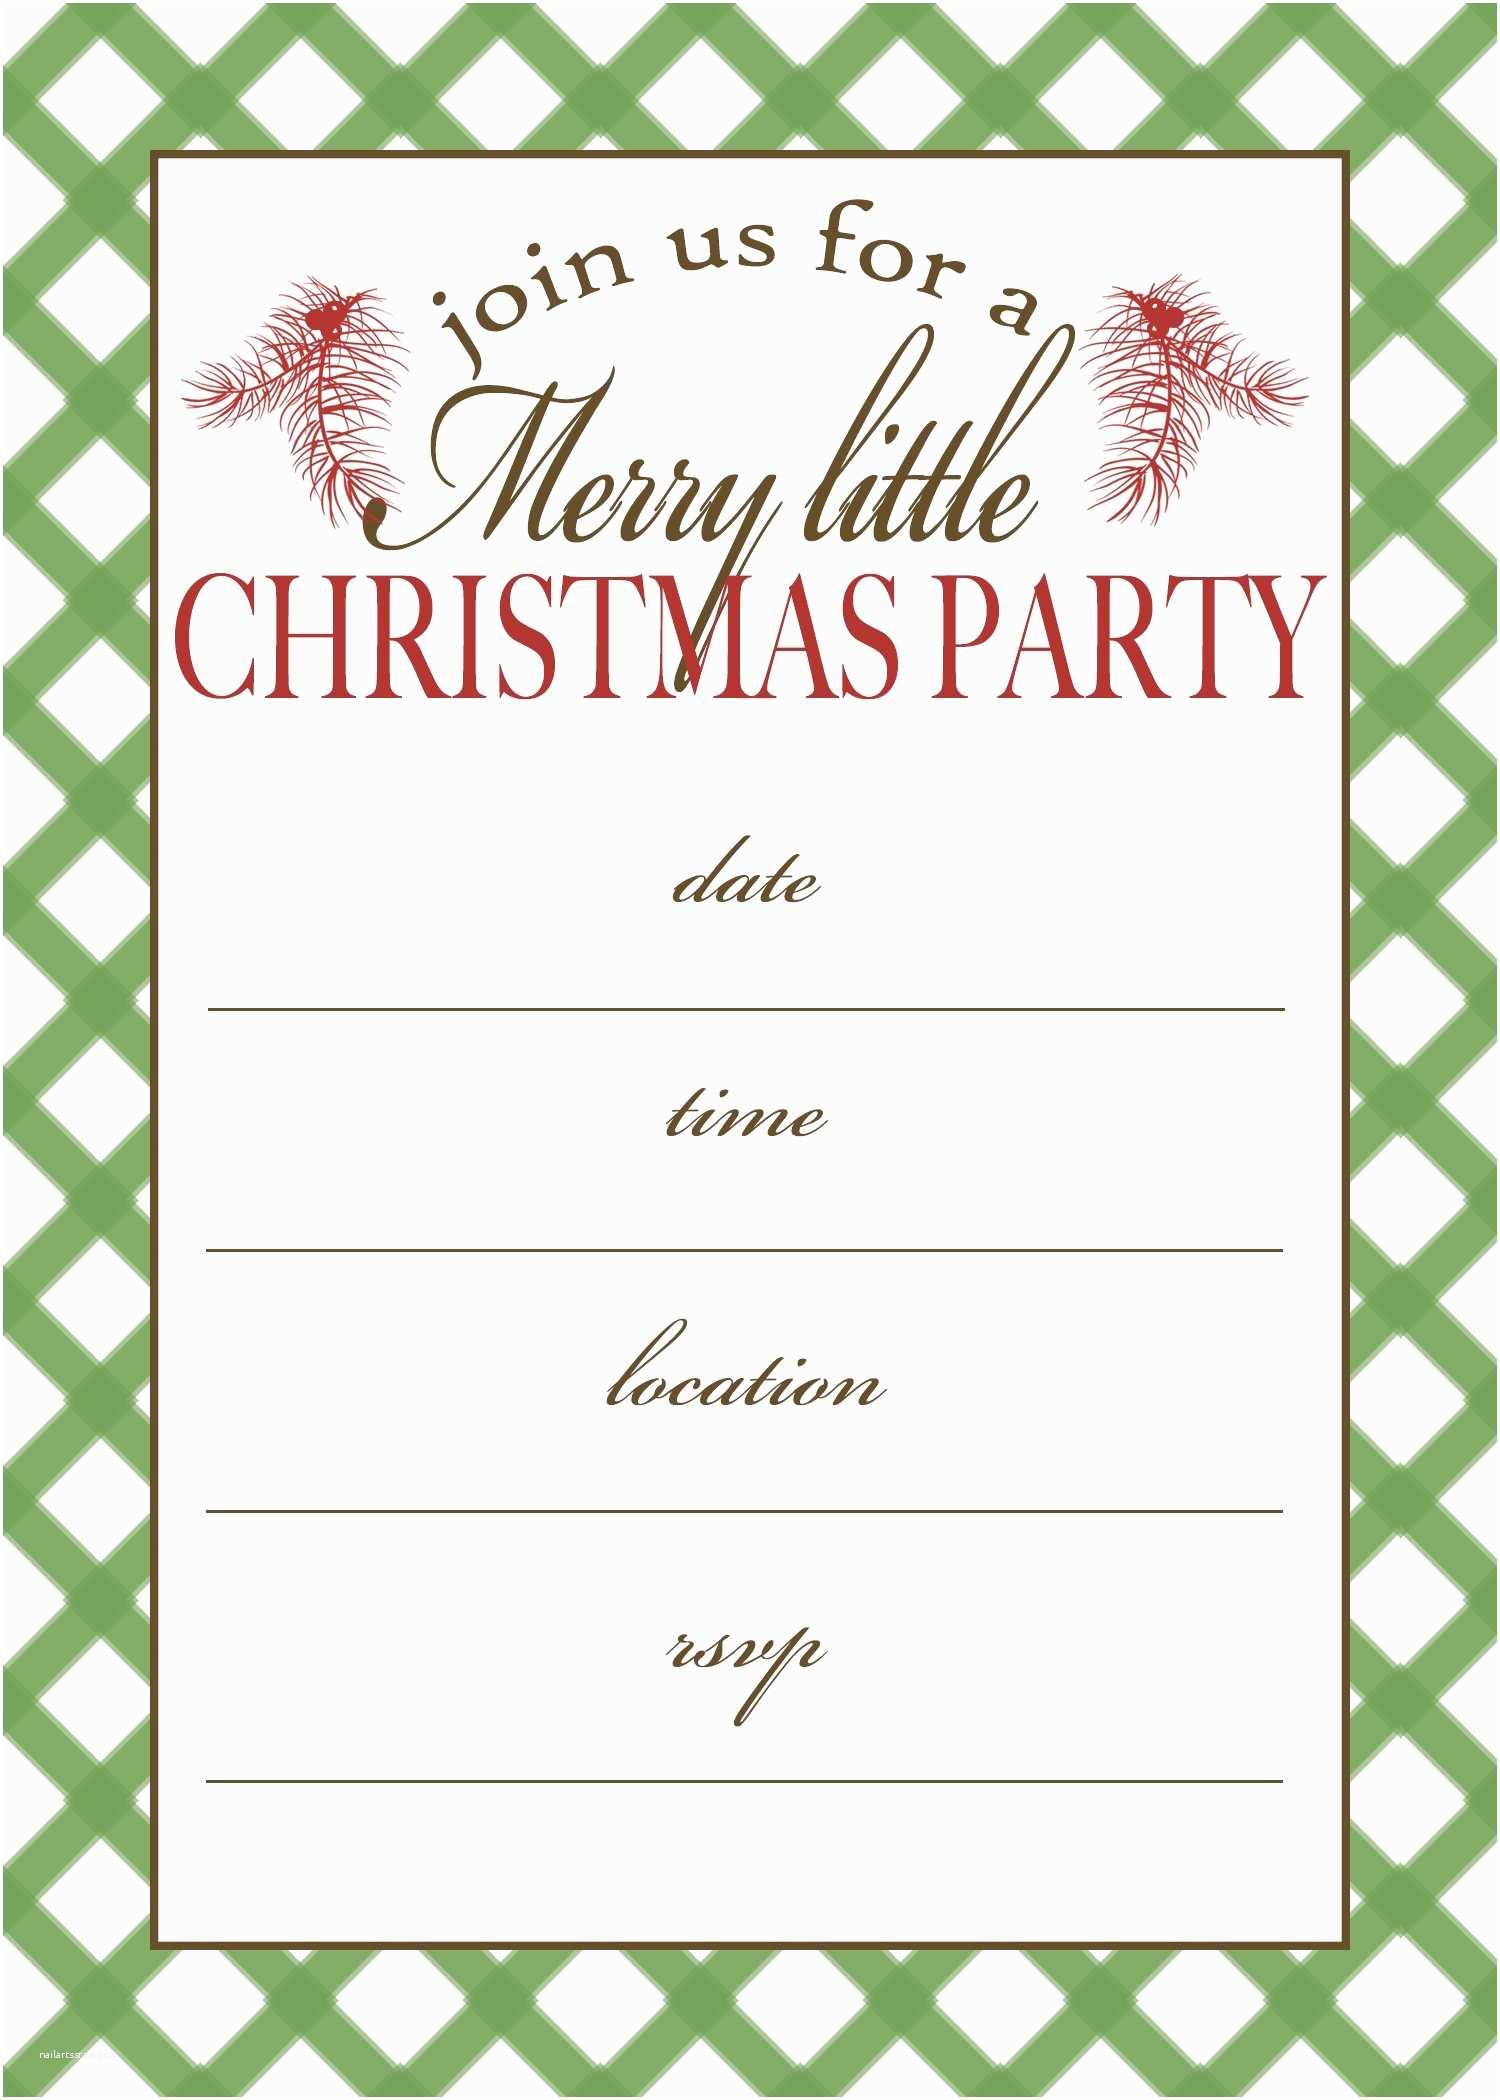 Free Printable Birthday Party Invitations Birthday Invitation Card Free Printable Birthday